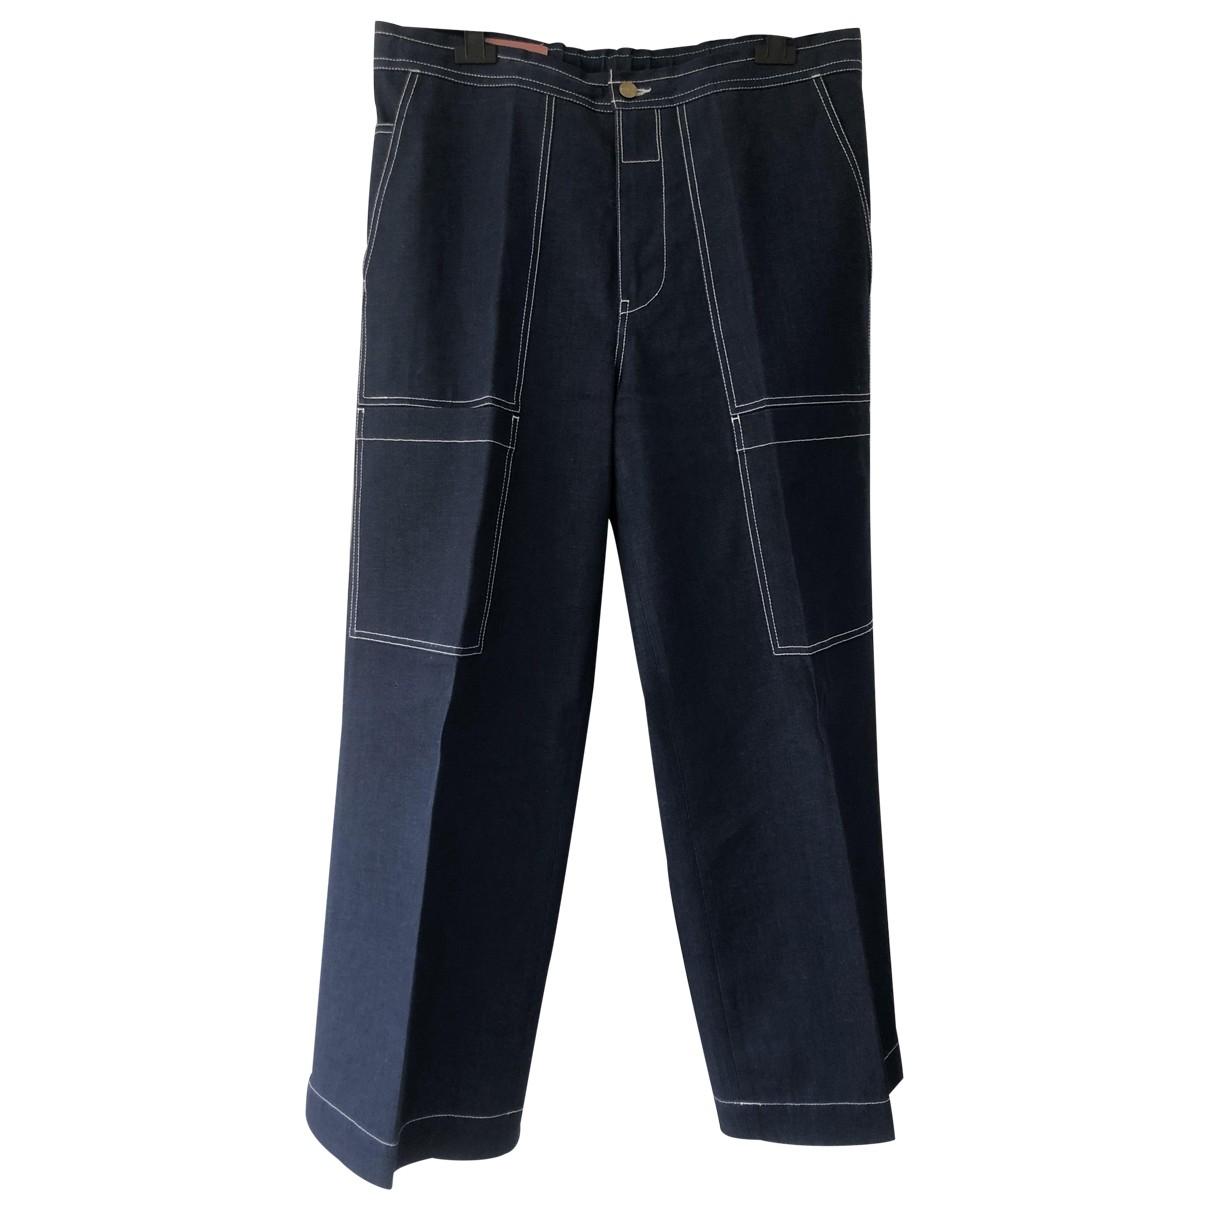 Acne Studios \N Navy Cotton Jeans for Men 42 FR